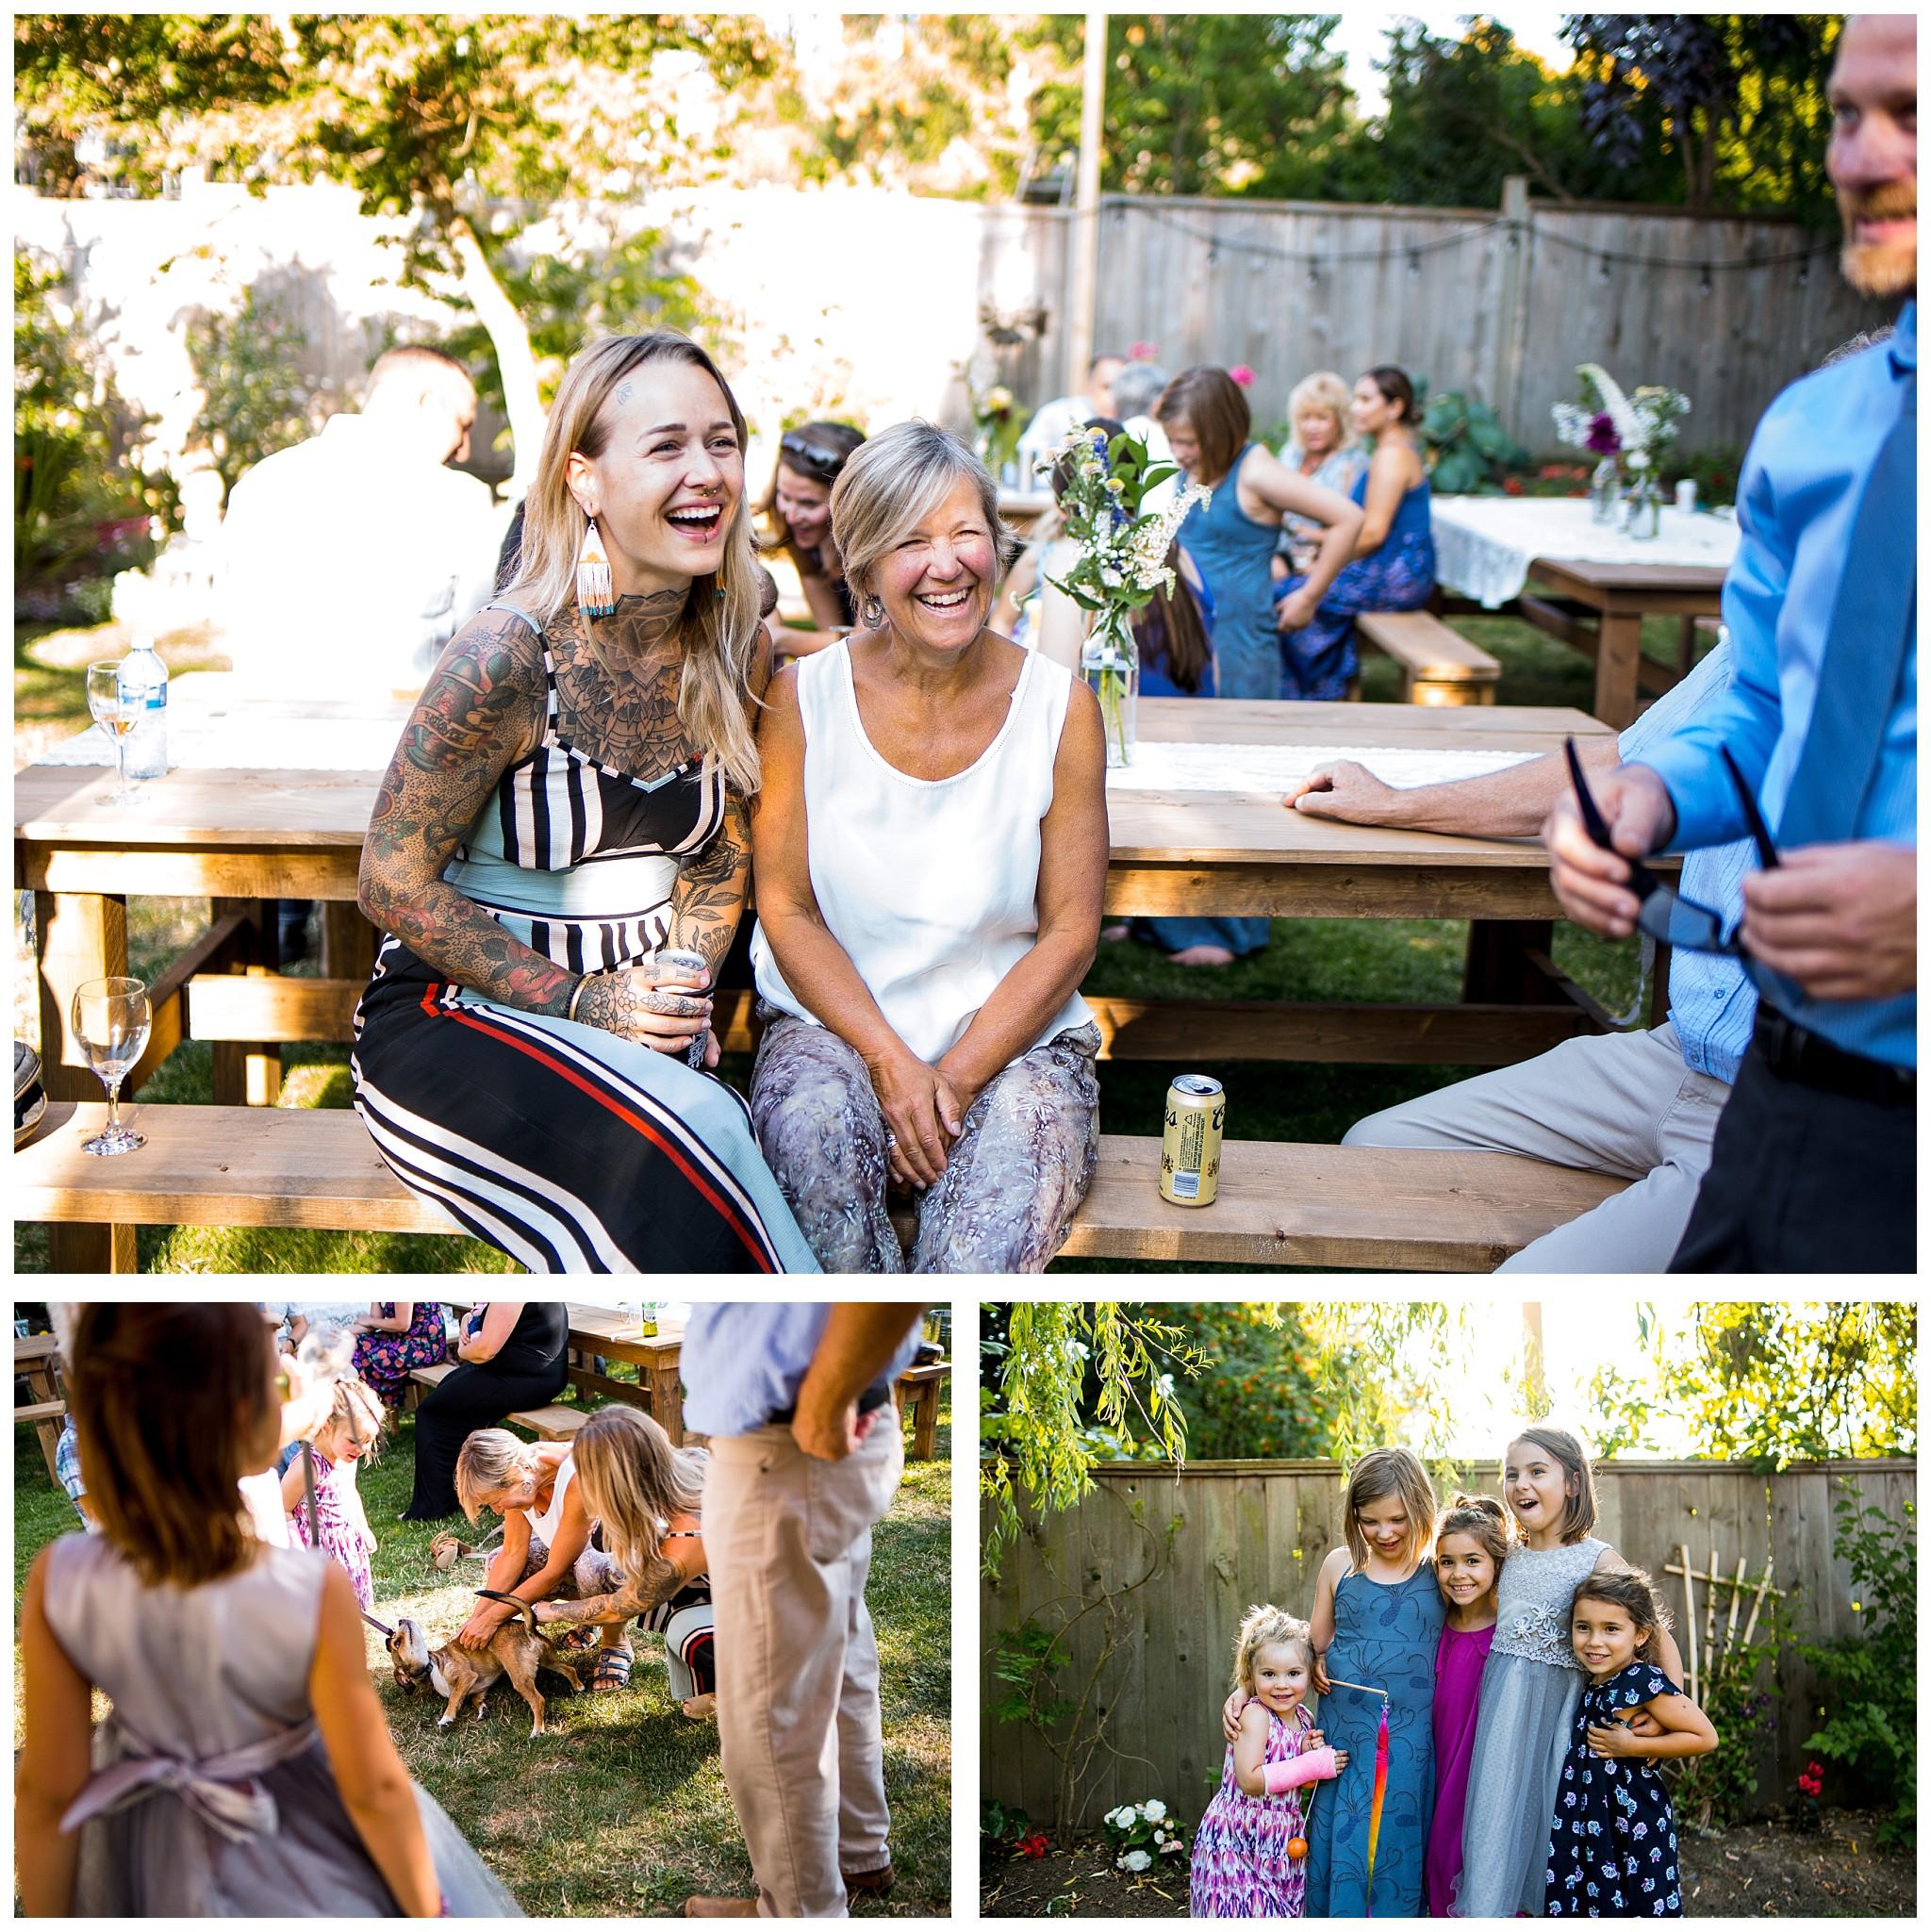 Aldergrove backyard summer wedding photographer bc canada outdoor garden inspiration family couple with kids, bride and groom_0072.jpg